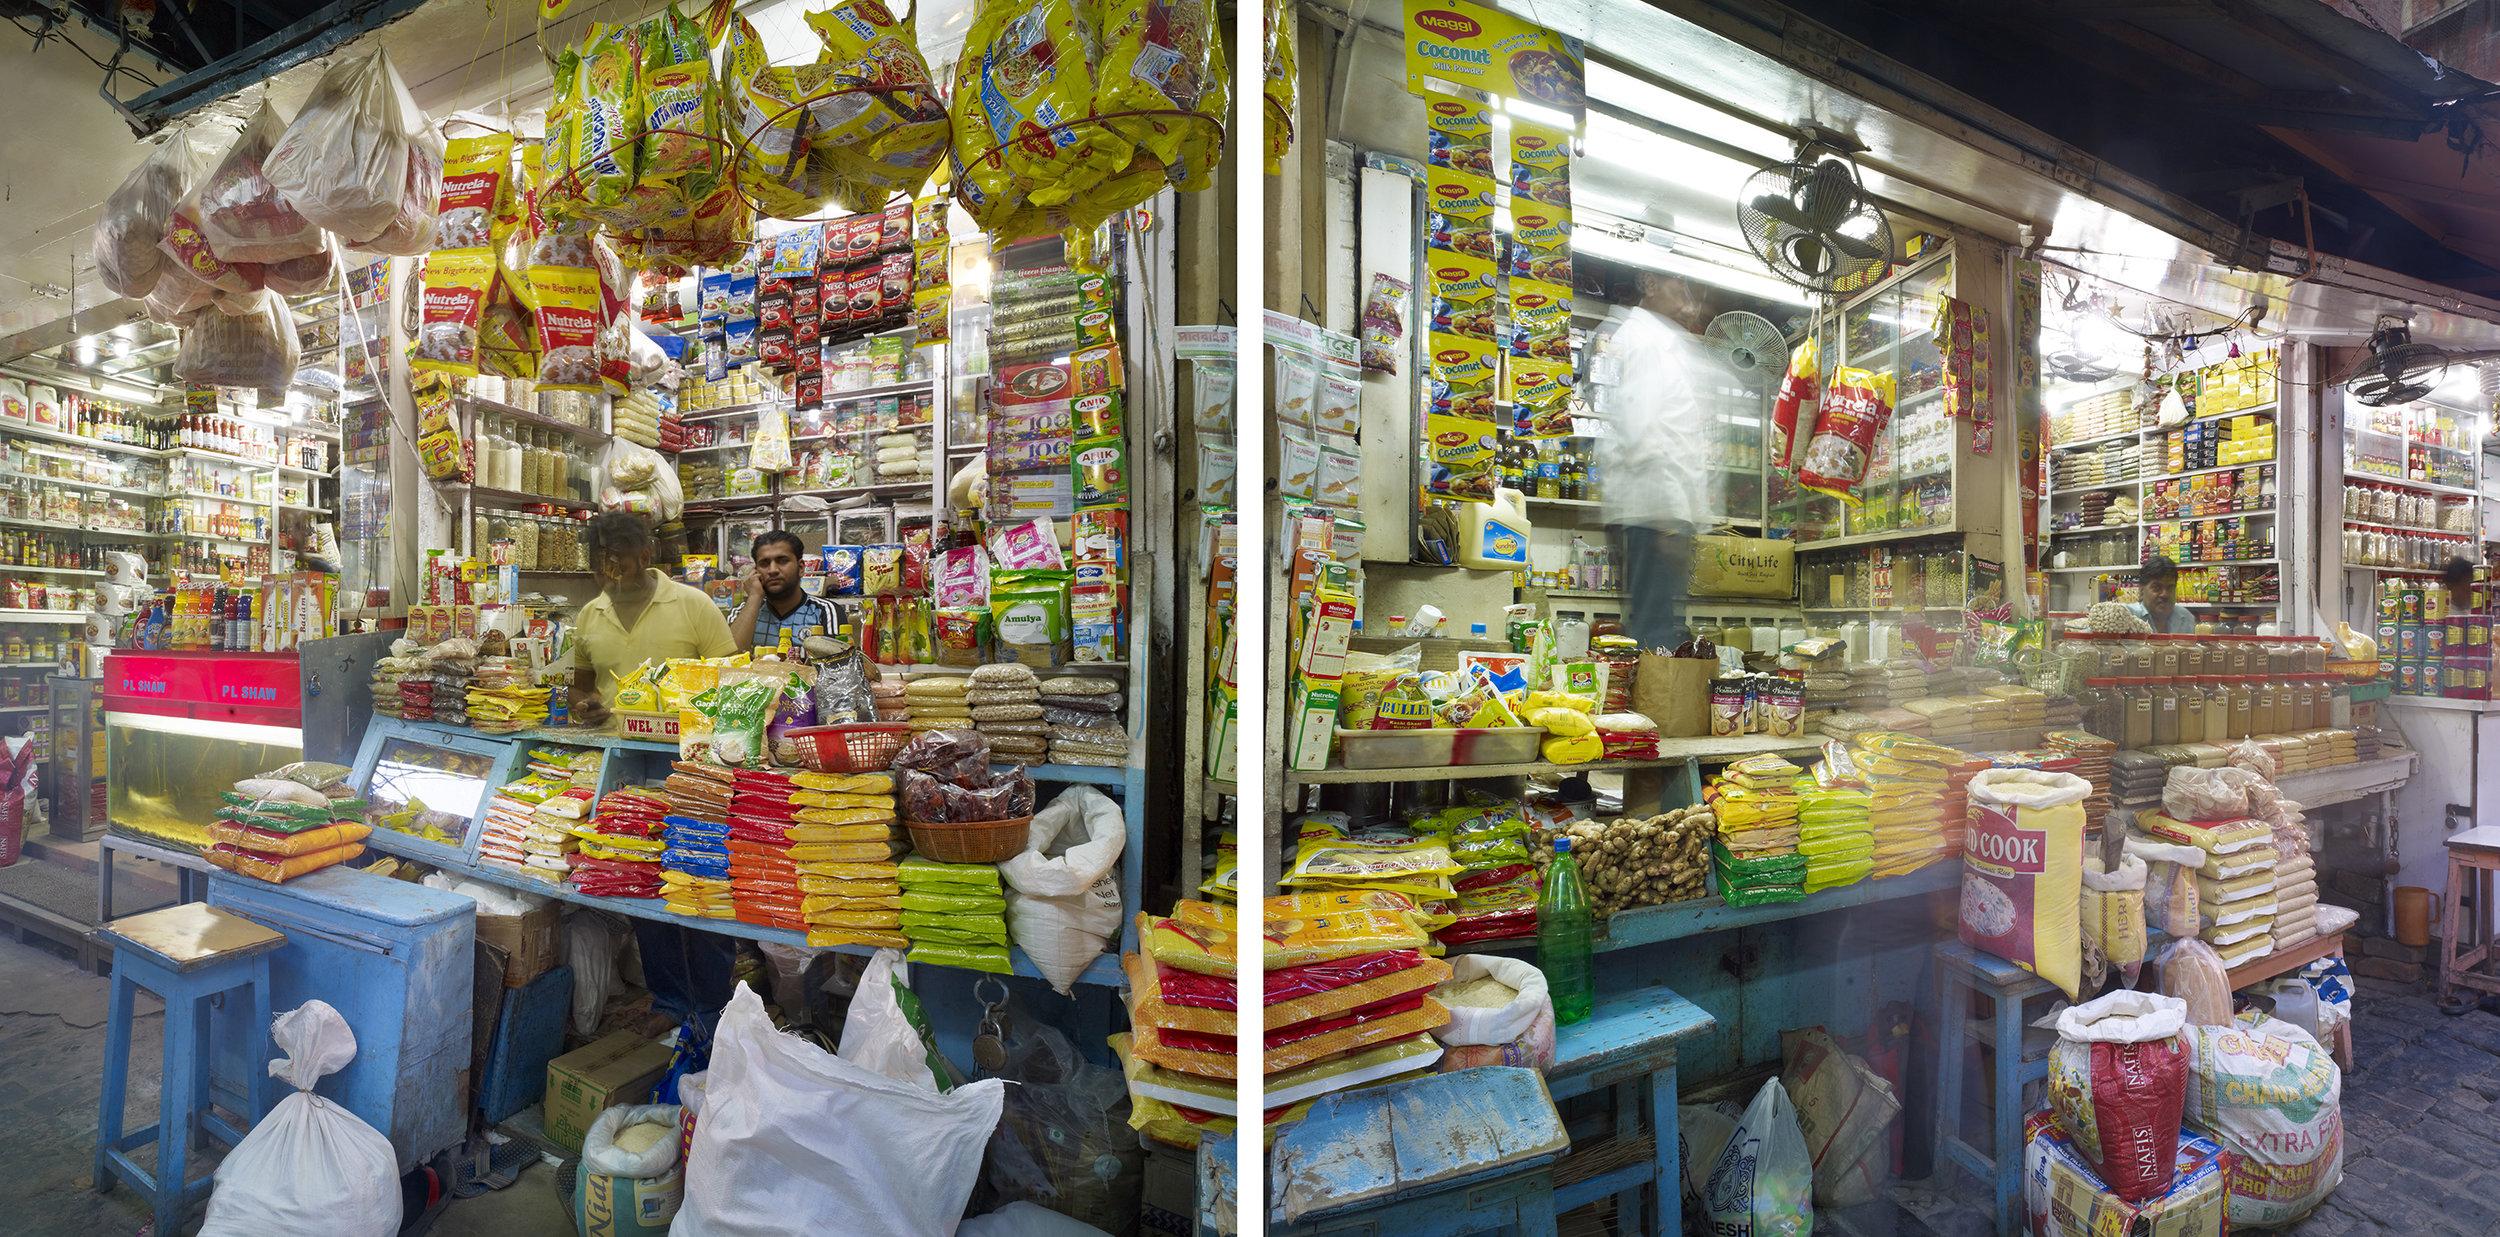 Hogg Street Market #12, Kolkata, India - 2013.jpg